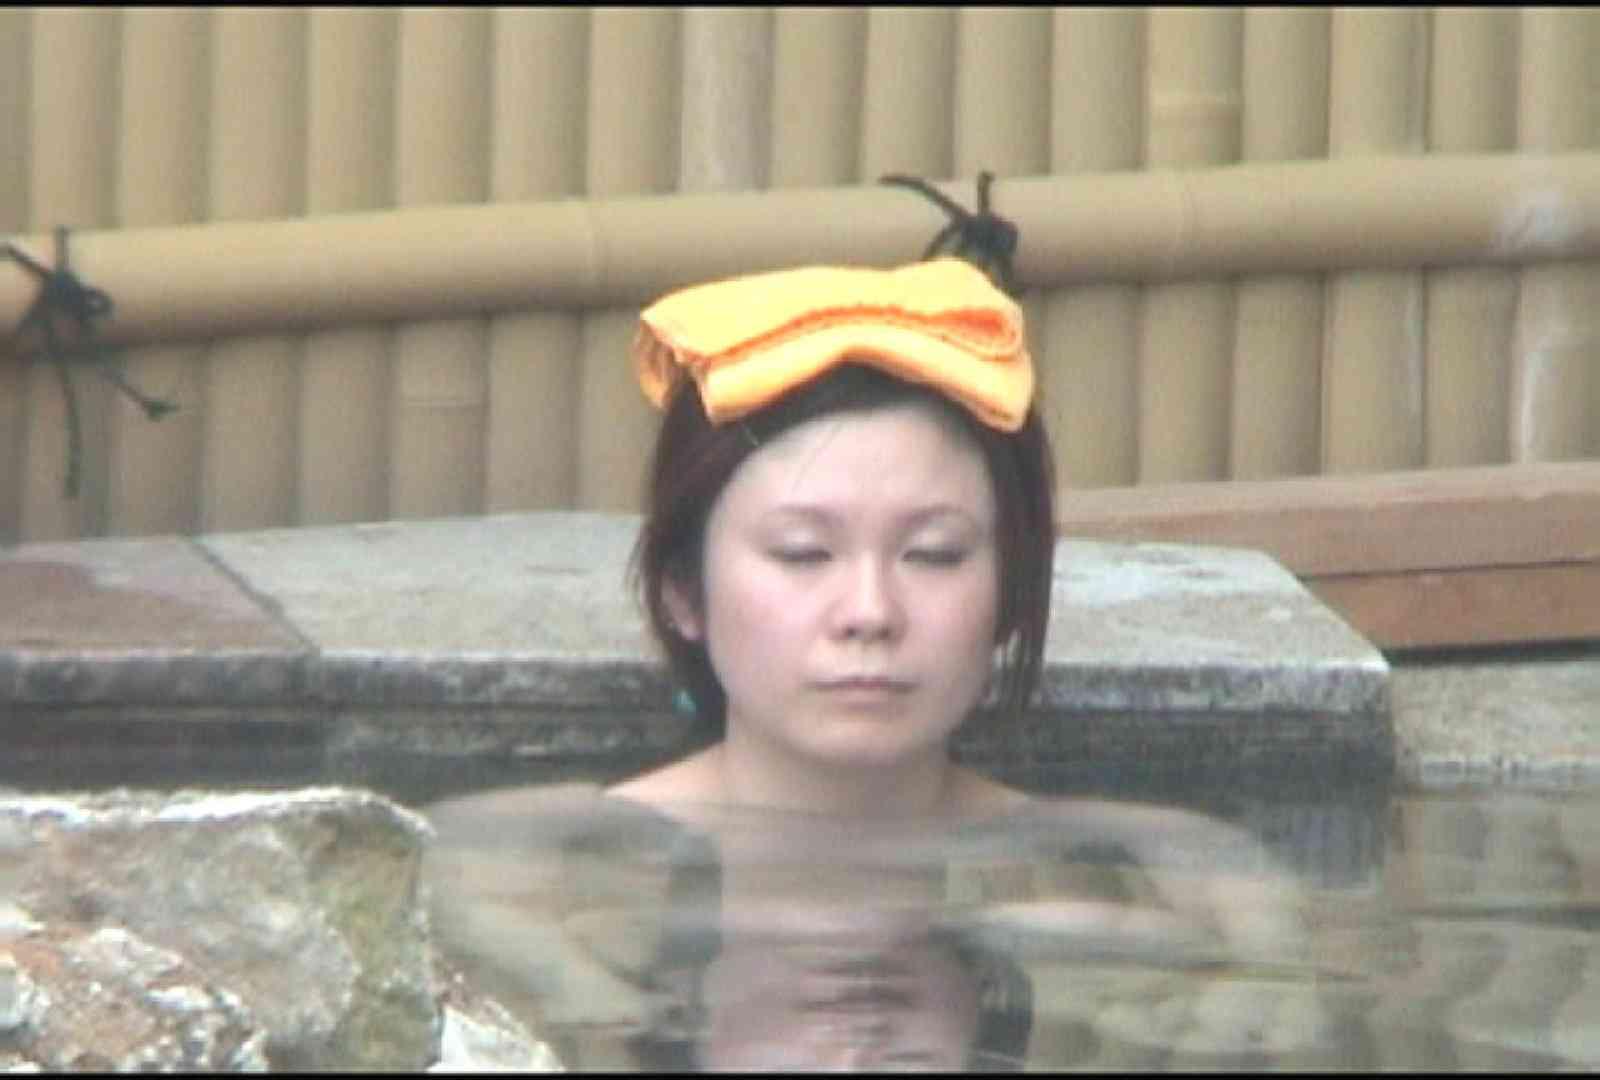 Aquaな露天風呂Vol.177 OLのエロ生活 オマンコ無修正動画無料 40連発 38